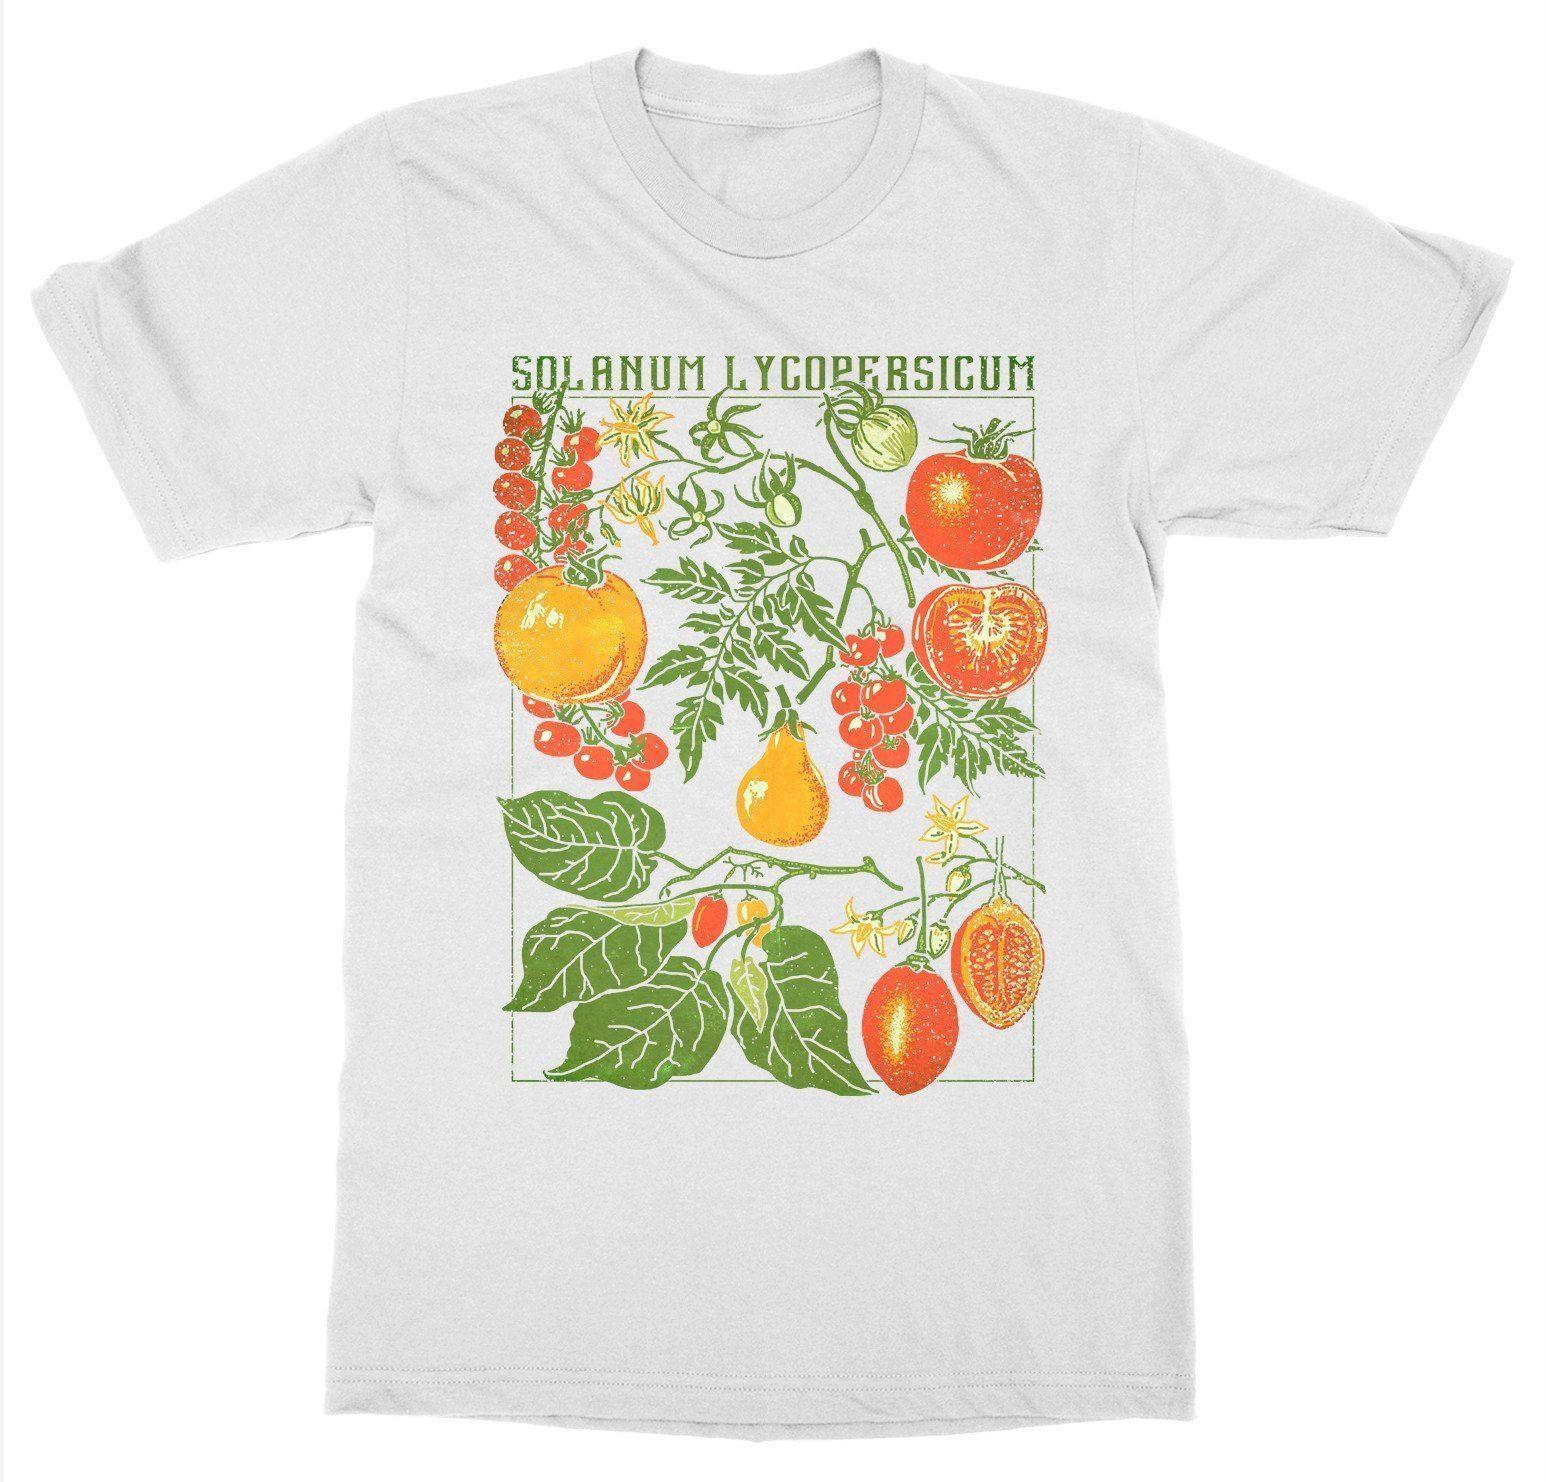 Tomato T Shirt Botanical Garden Plant Print Art Botany Bloom Fruit Flower  Grow Cool Tshirts Retro T Shirts From Mrbronson79 0cf0938eff0e